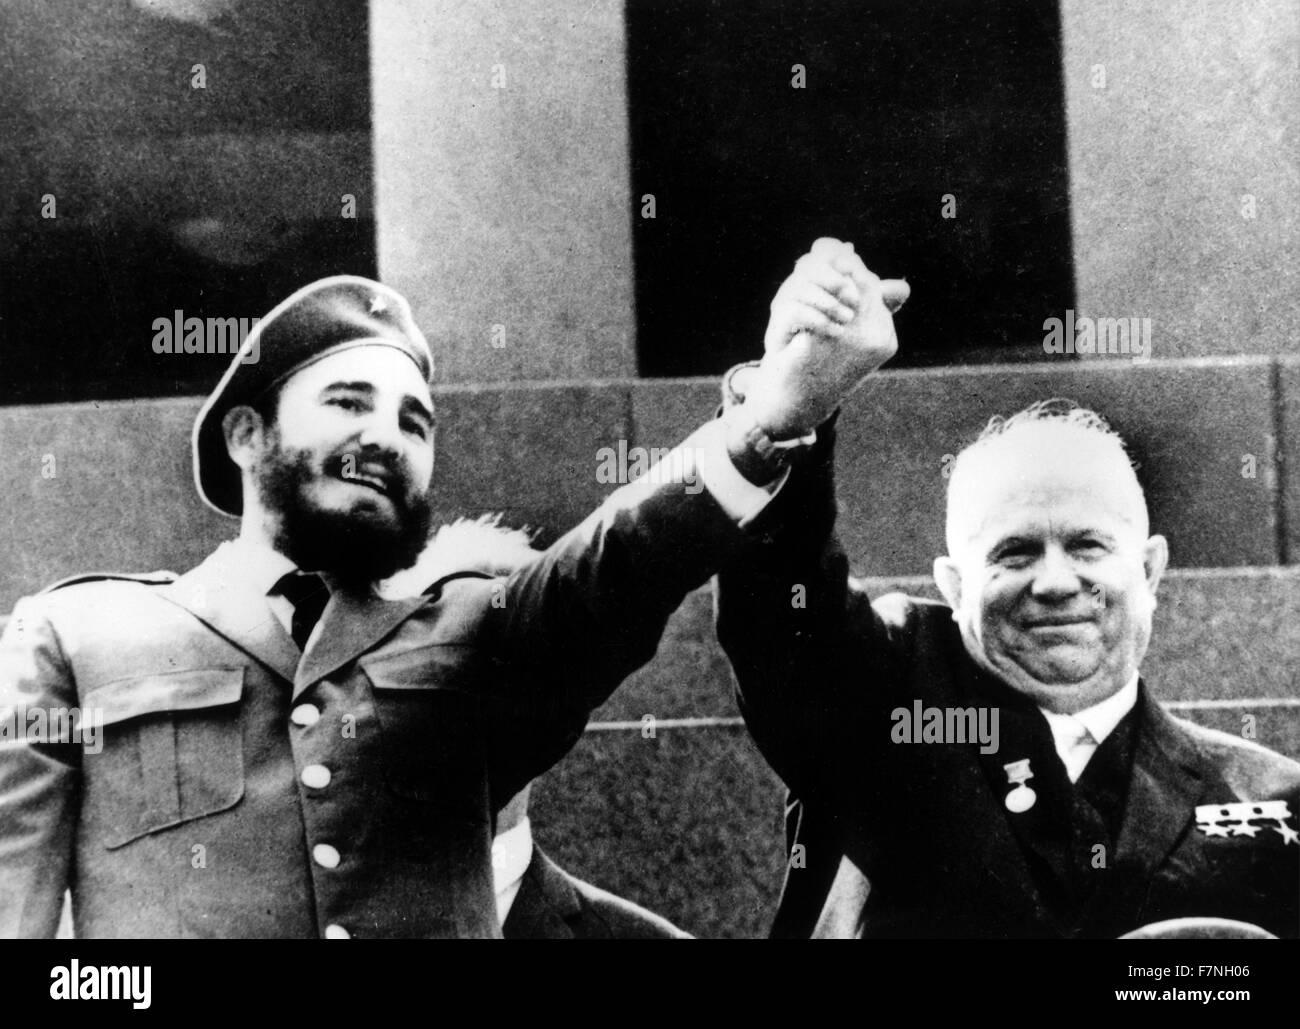 Photograph of Fidel Castro (1926-) and Nikita Khrushchev (1894-1971) in front of the tomb of Vladimir Lenin (1970 - Stock Image